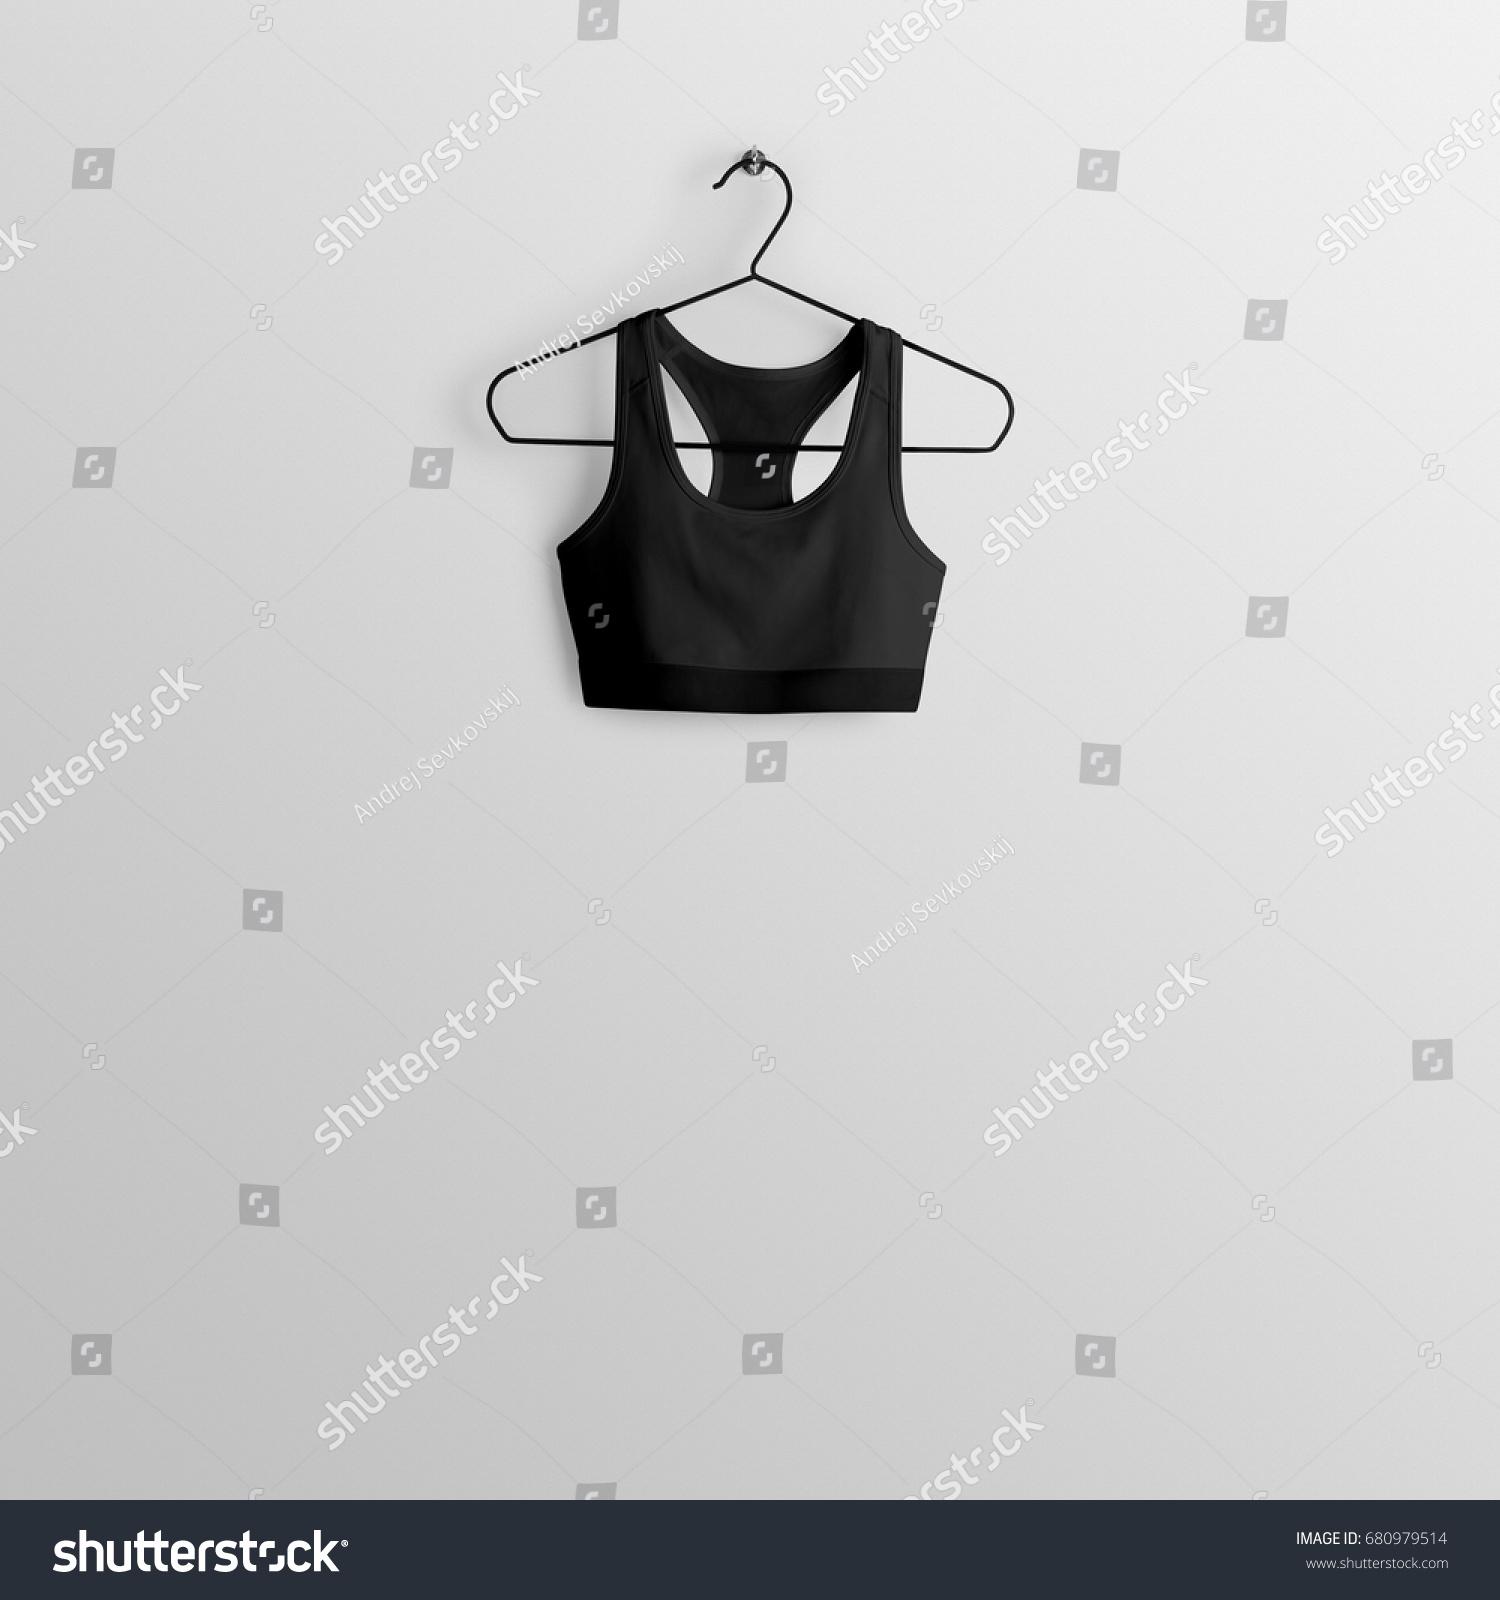 8c5eefac3e8eb Stock photo black sport bra crop top mockup on hanger hanging against empty  wall background jpg